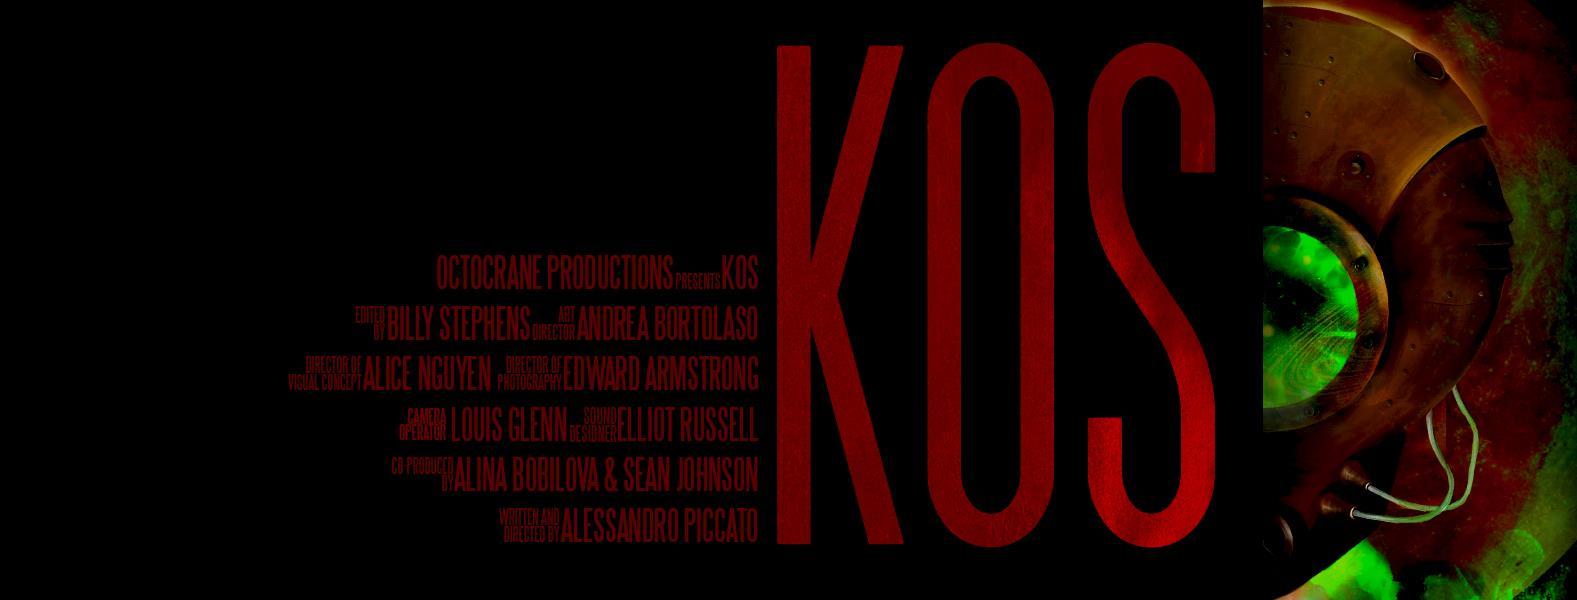 KOS (Scenariu și Regia Alessandro Picatto)